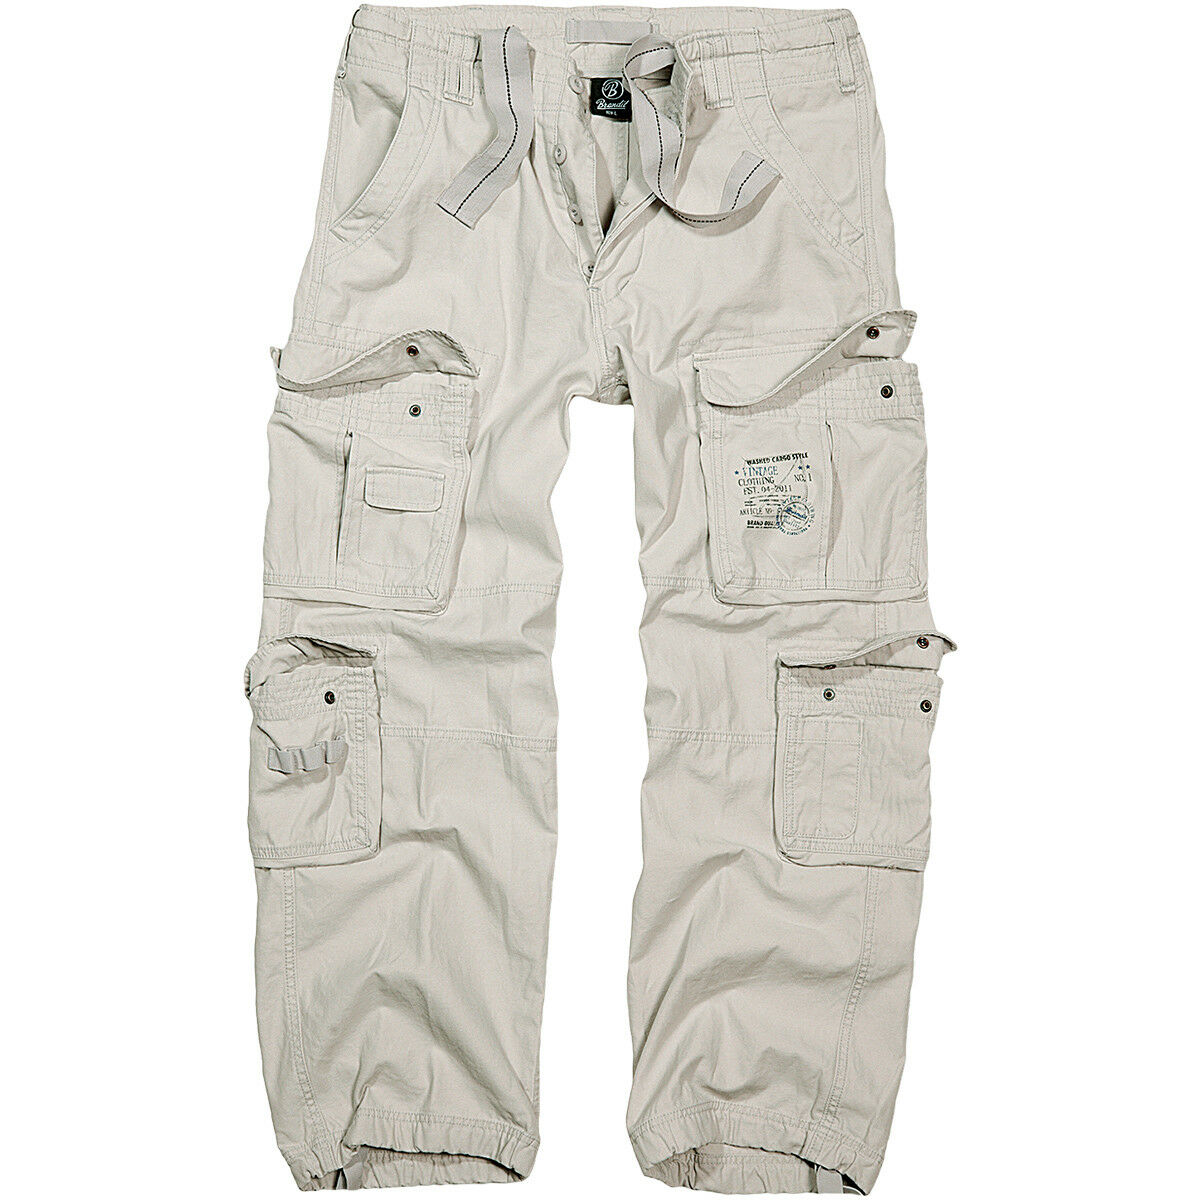 Brandit Brandit Brandit Uomo Classici Puro Vintage Combattimento Pantaloni Off Trasferte Pant Bi cd9a83